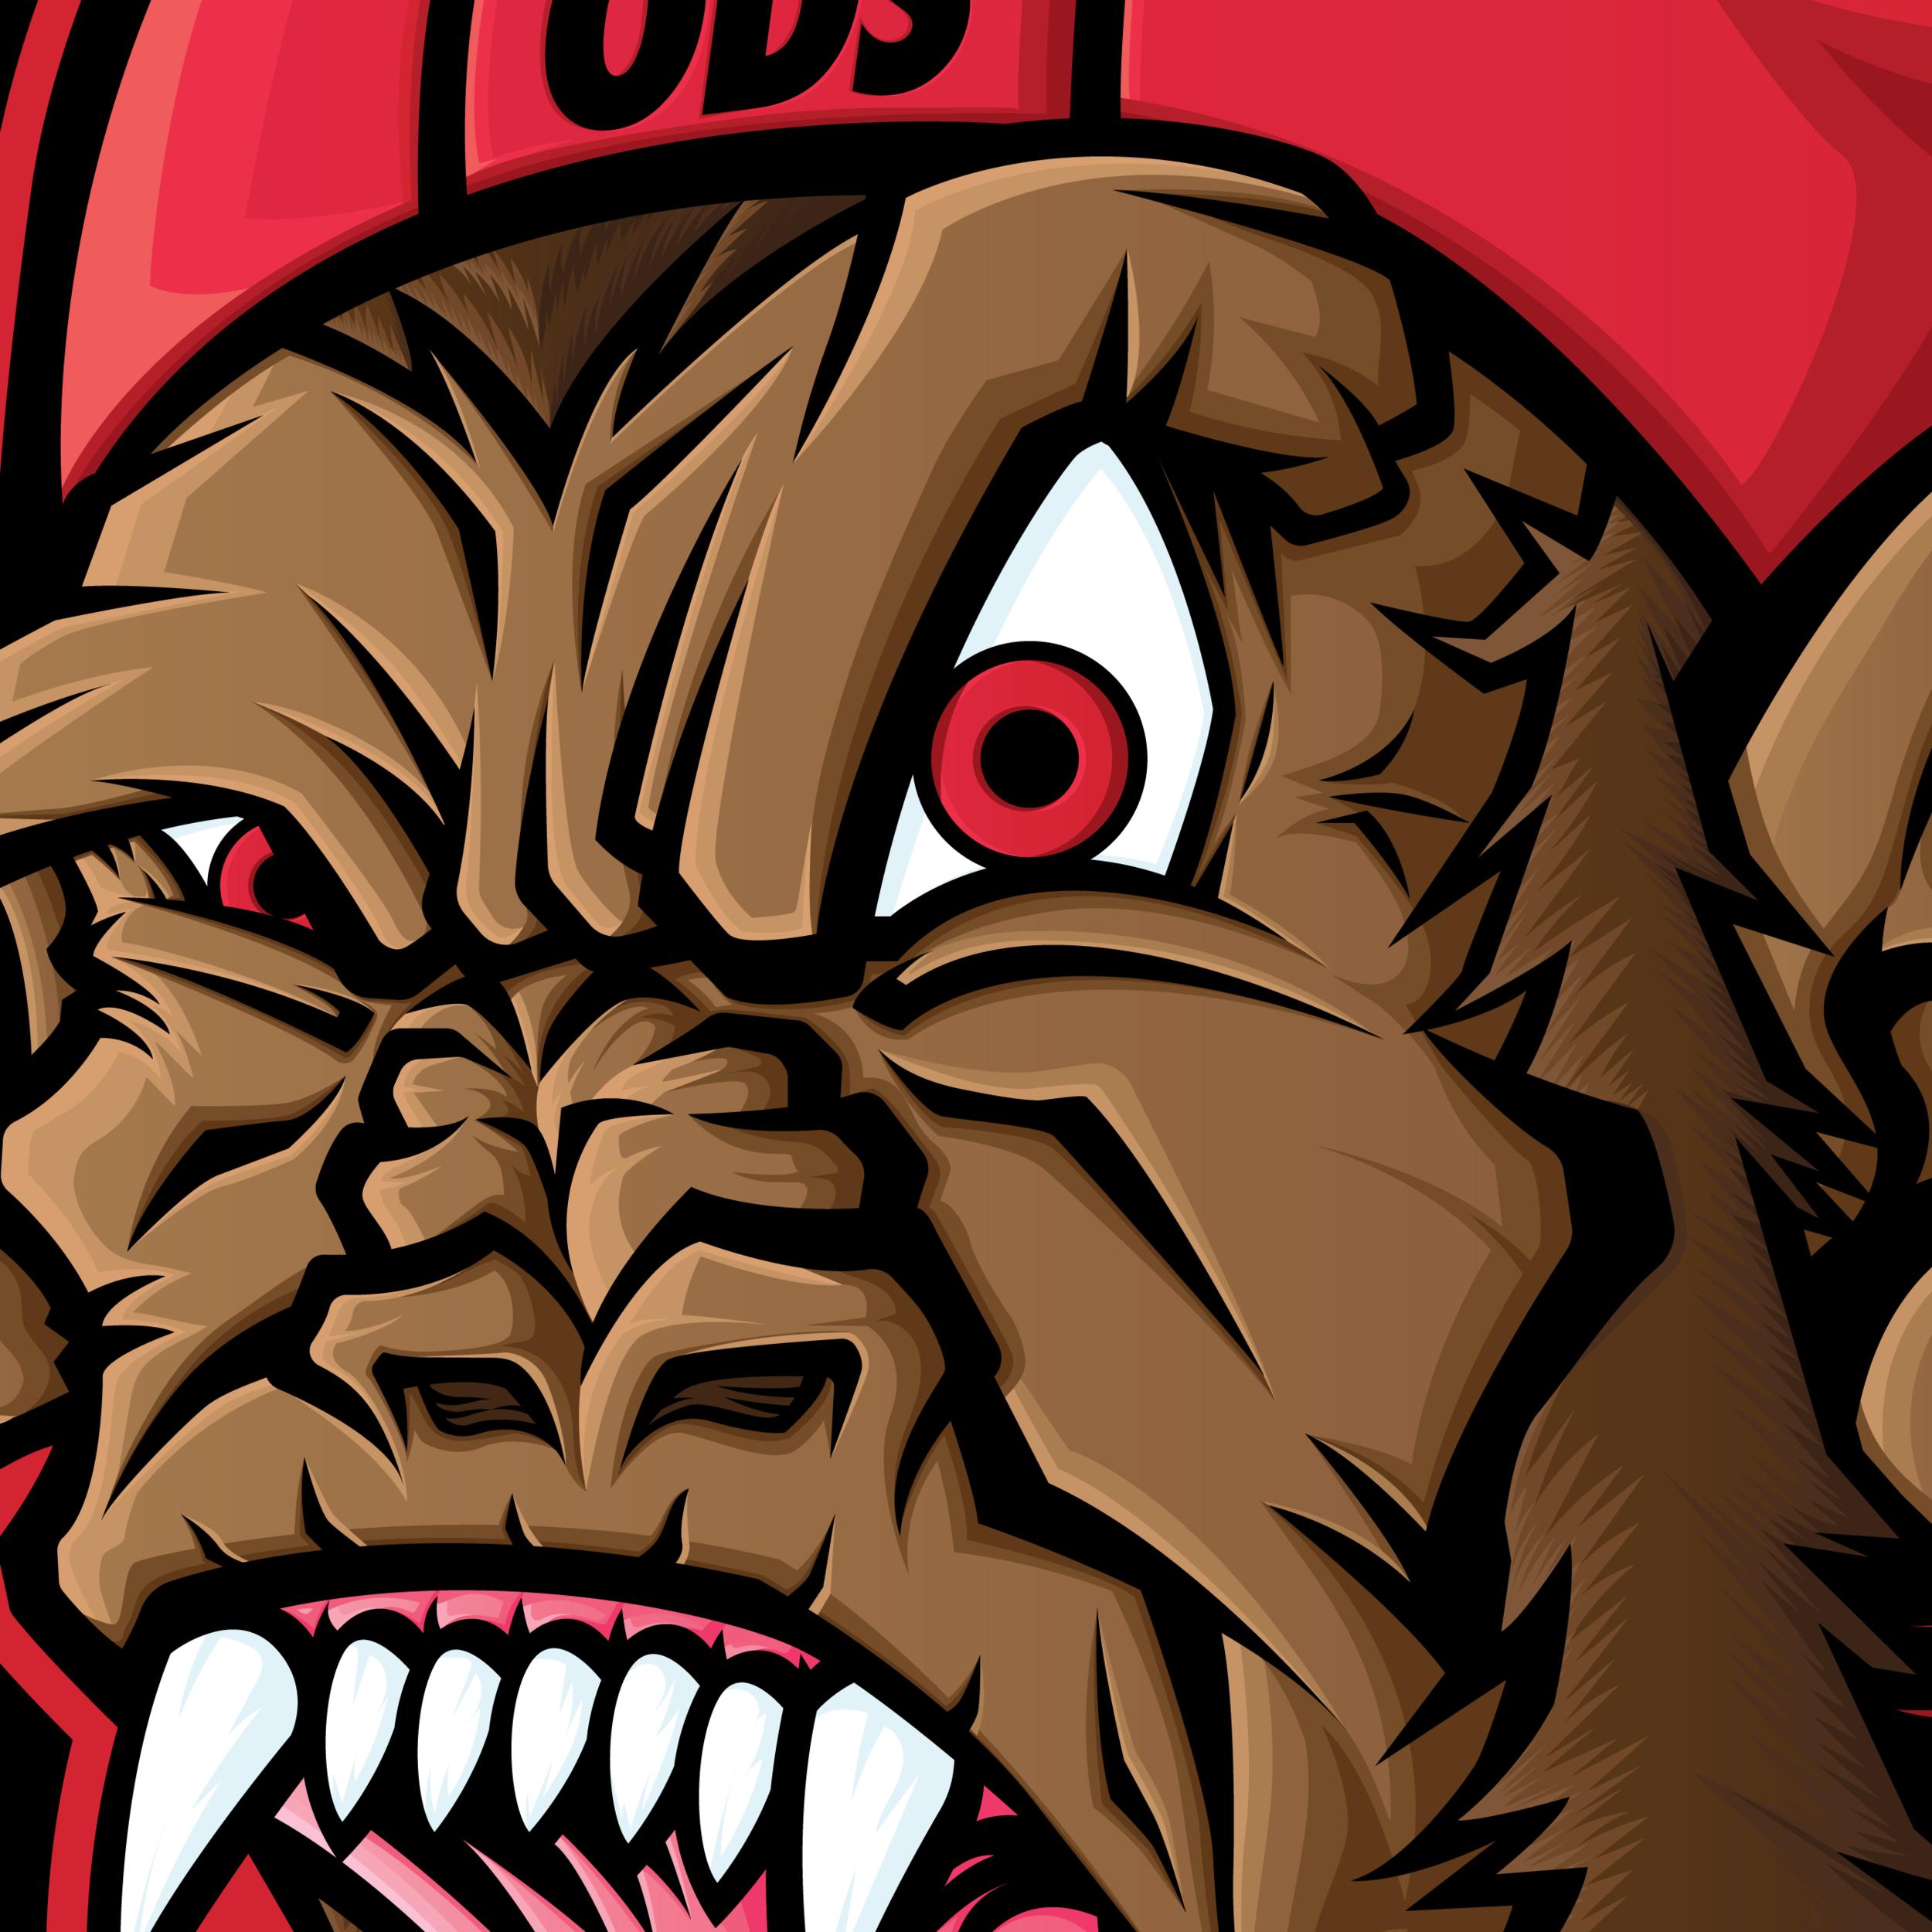 ODS-orozcodesign-monkey-ape,chimp-illustration-vector-illustrator-artist-roberto-orozco-digital-design-closeup.jpg